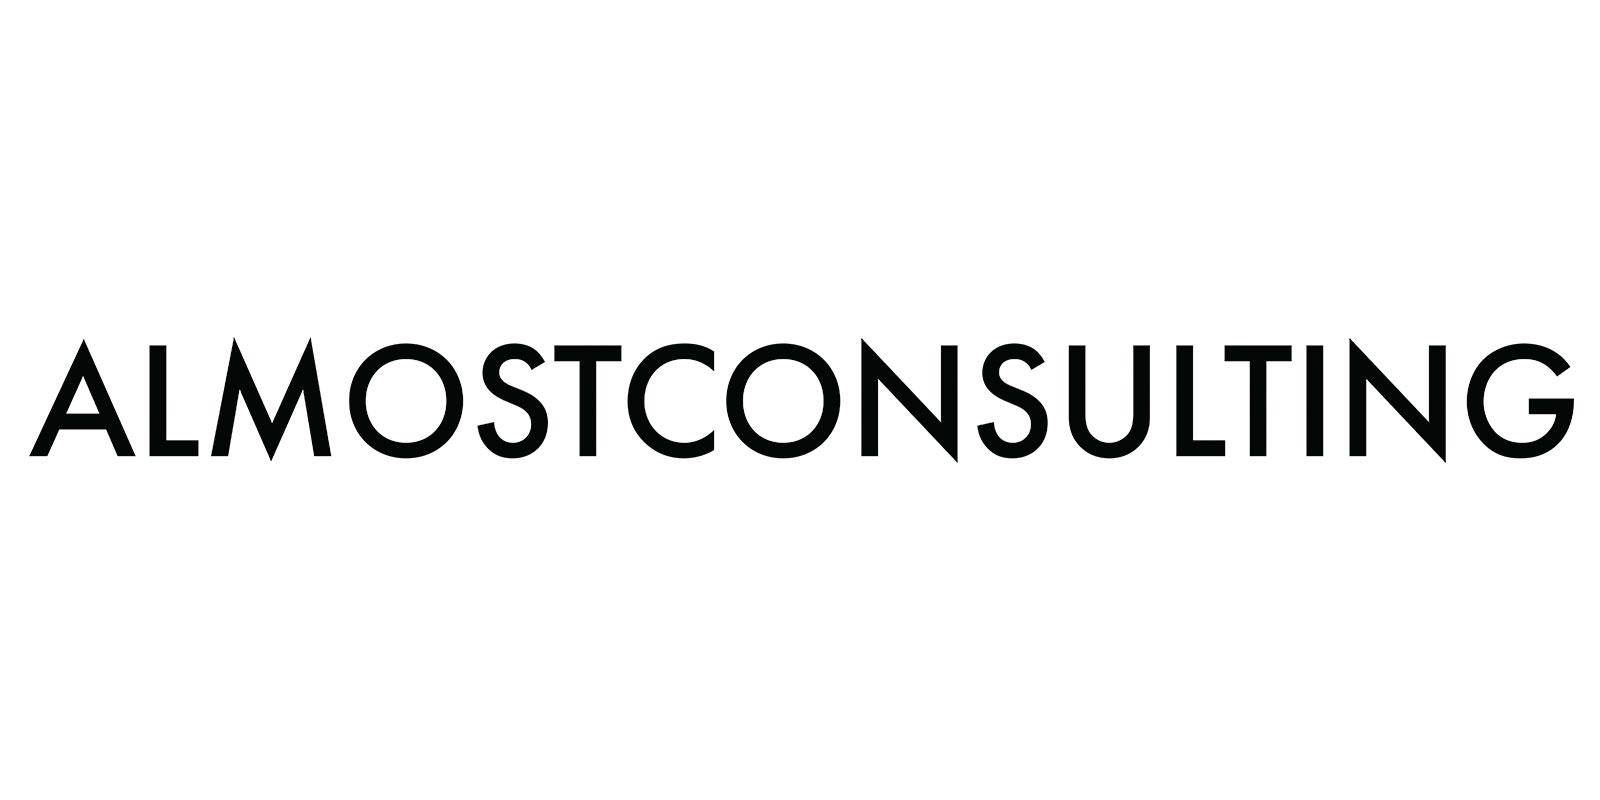 almostconsulting-logo-doublesquare.jpg